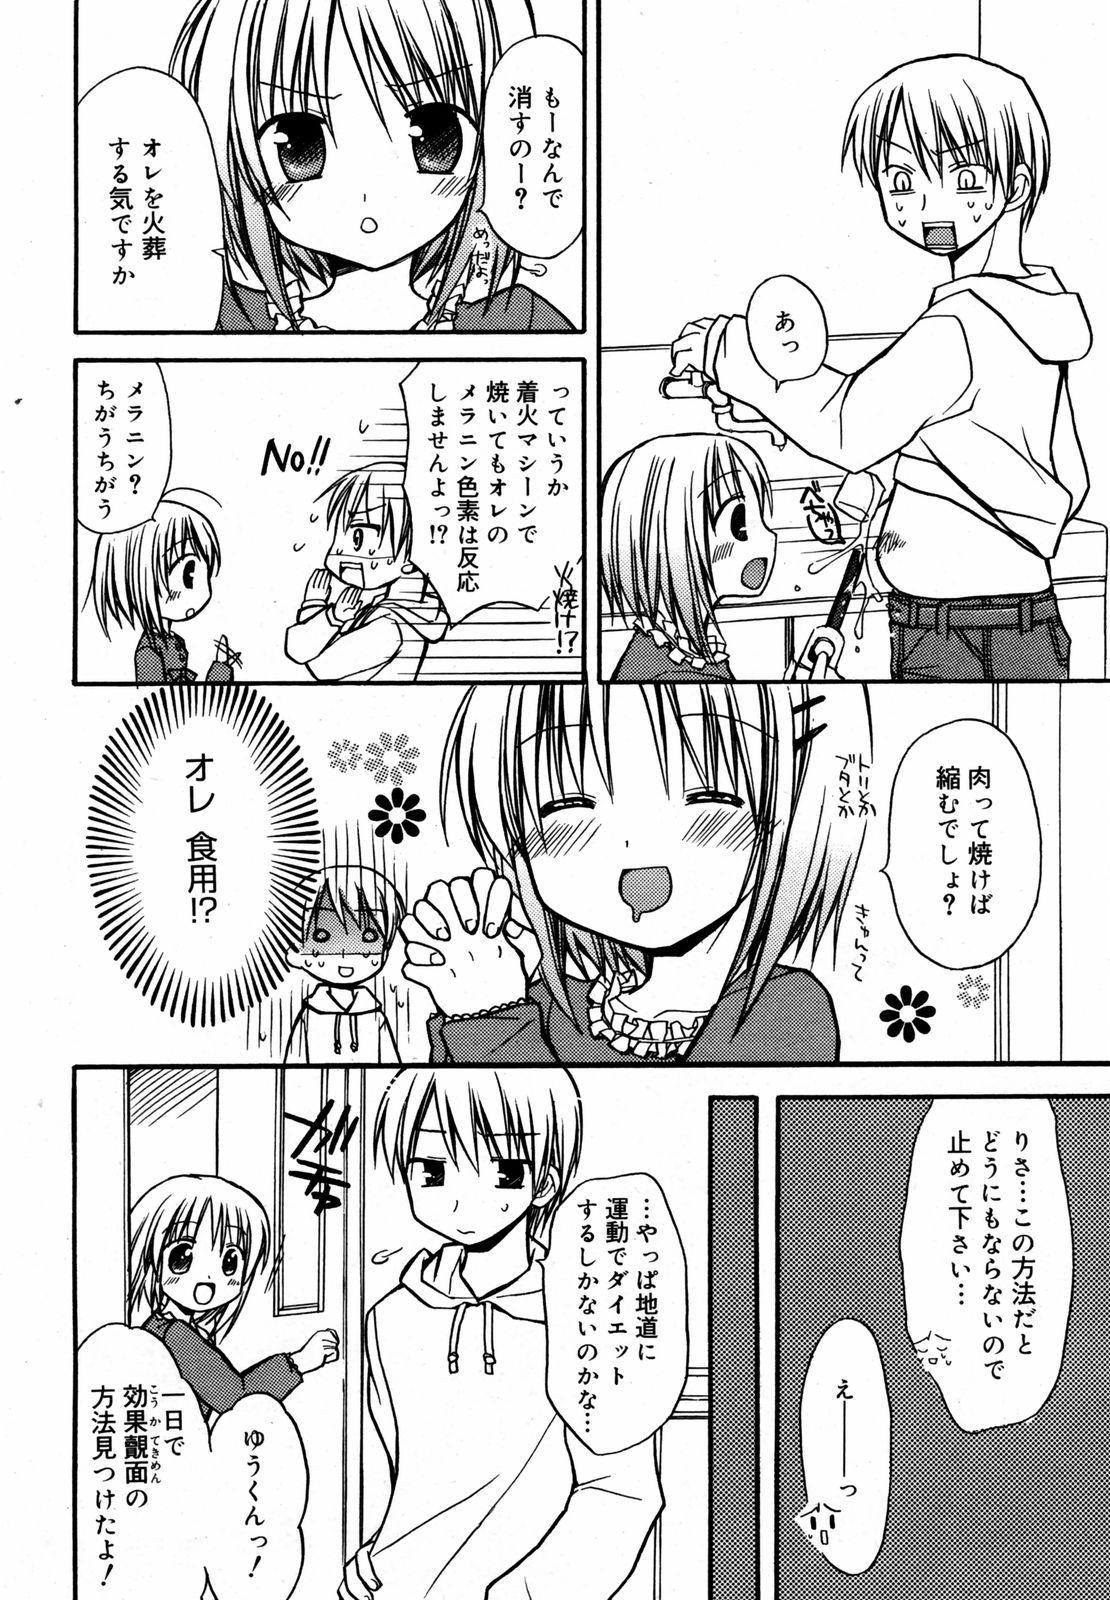 Manga Bangaichi 2008-03 27